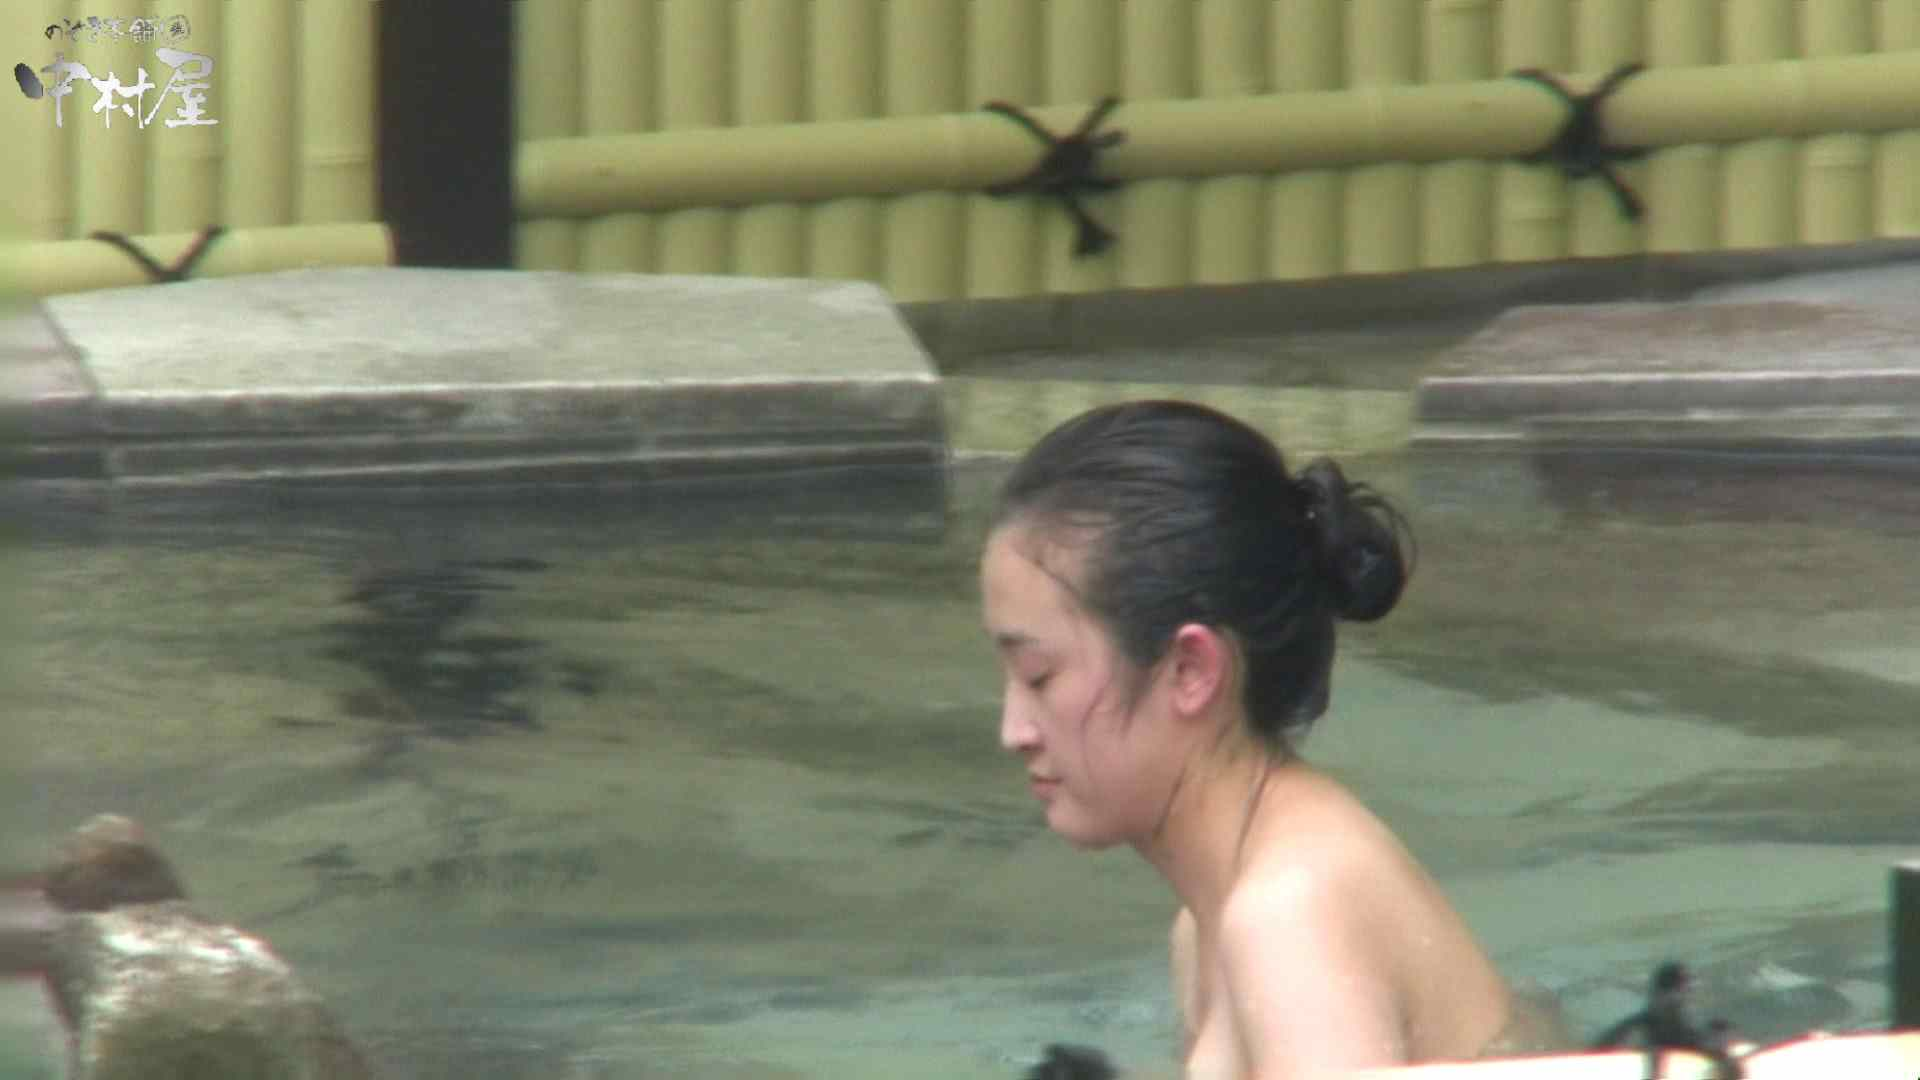 Aquaな露天風呂Vol.949 露天風呂 セックス画像 67連発 32